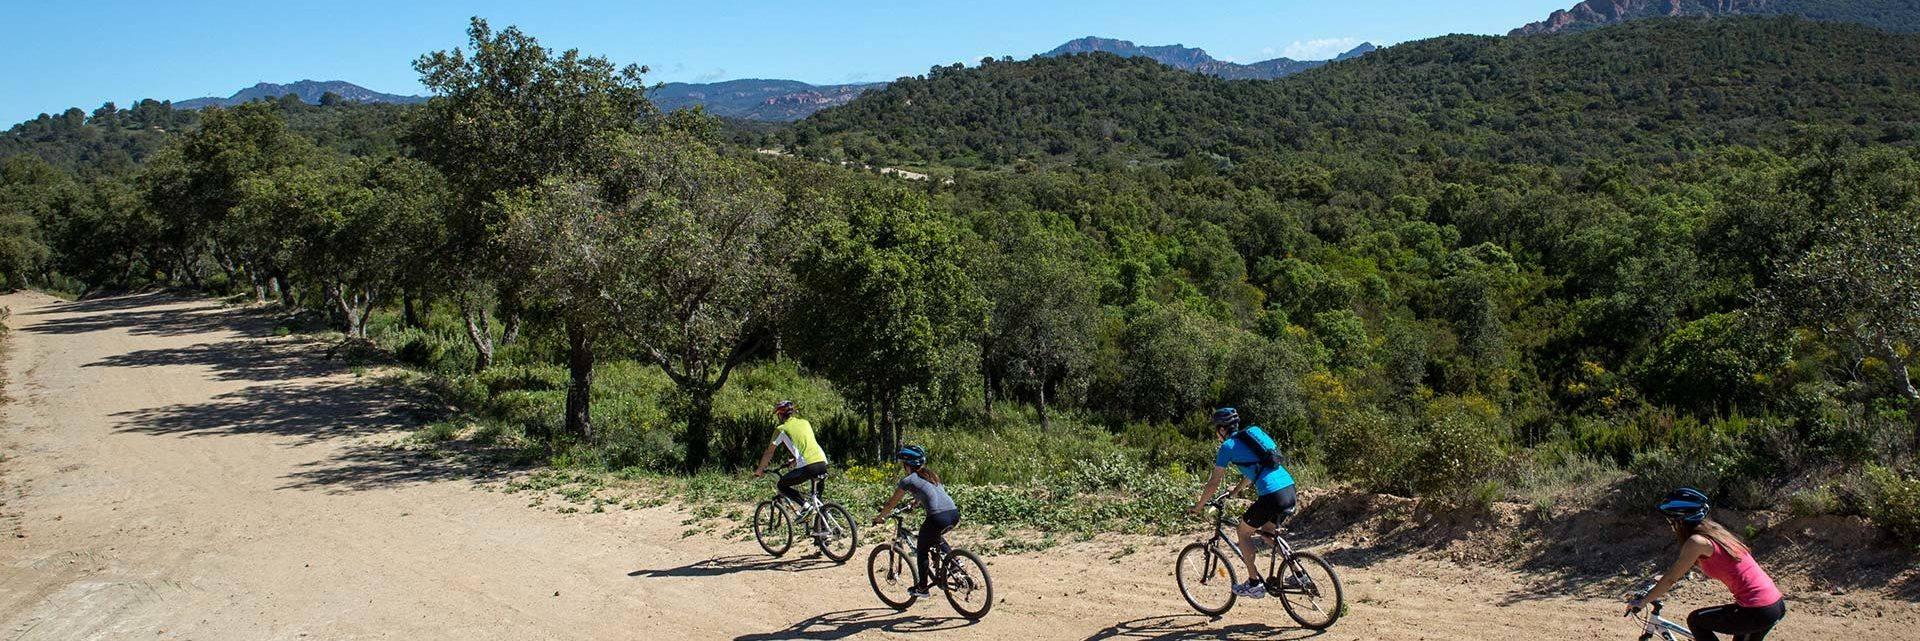 Mountain biking in the Estérel